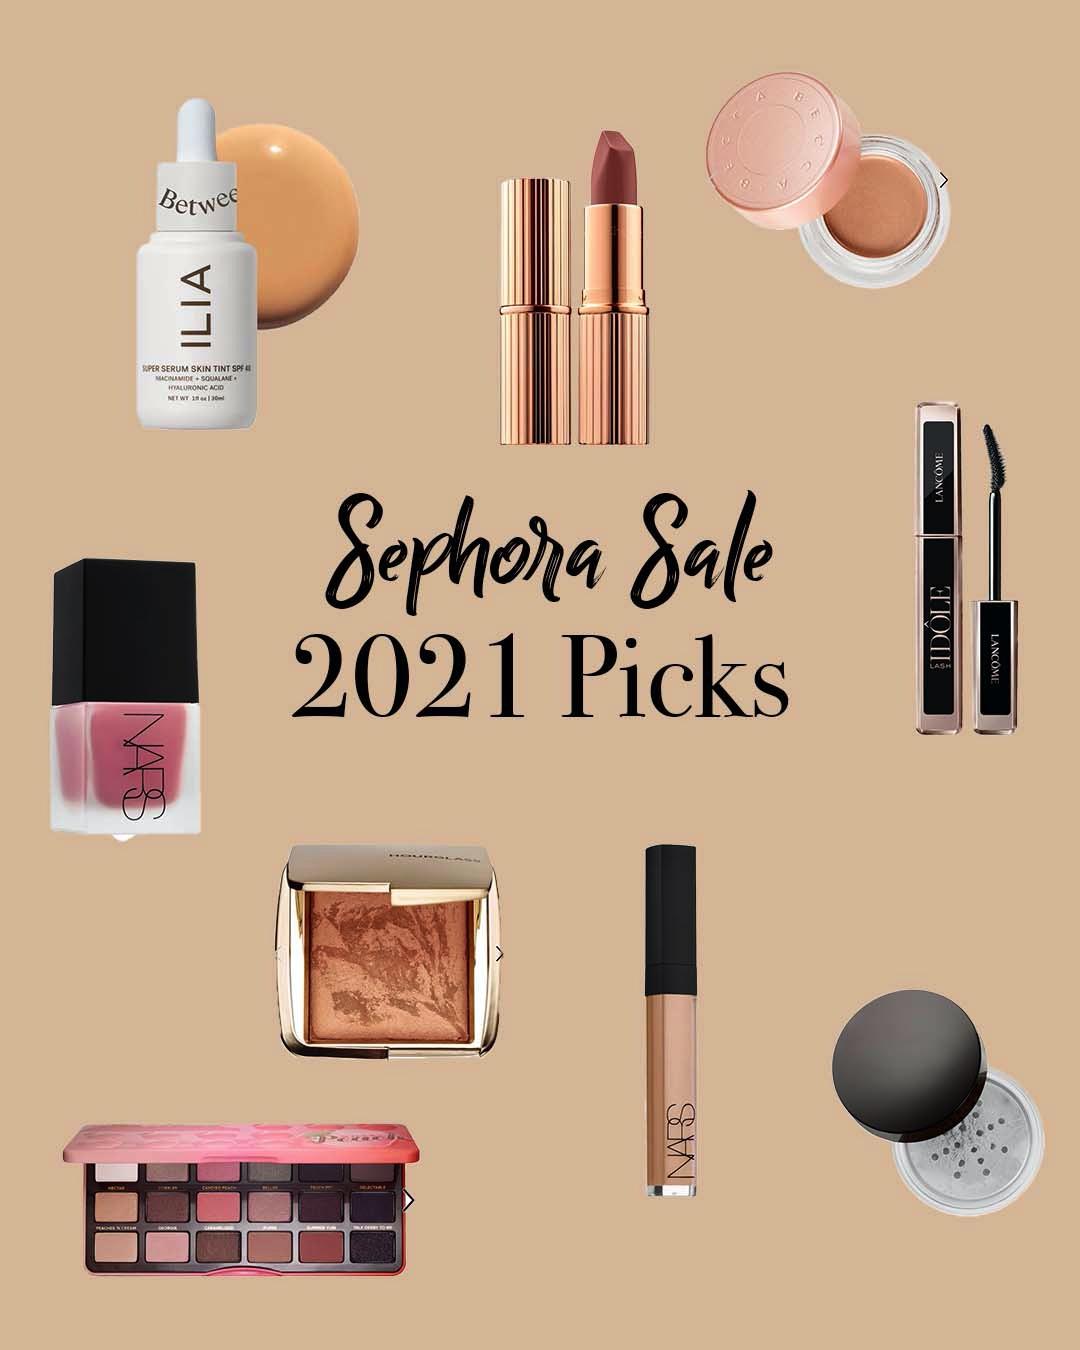 Nita mann shares her picks from the sephora sale